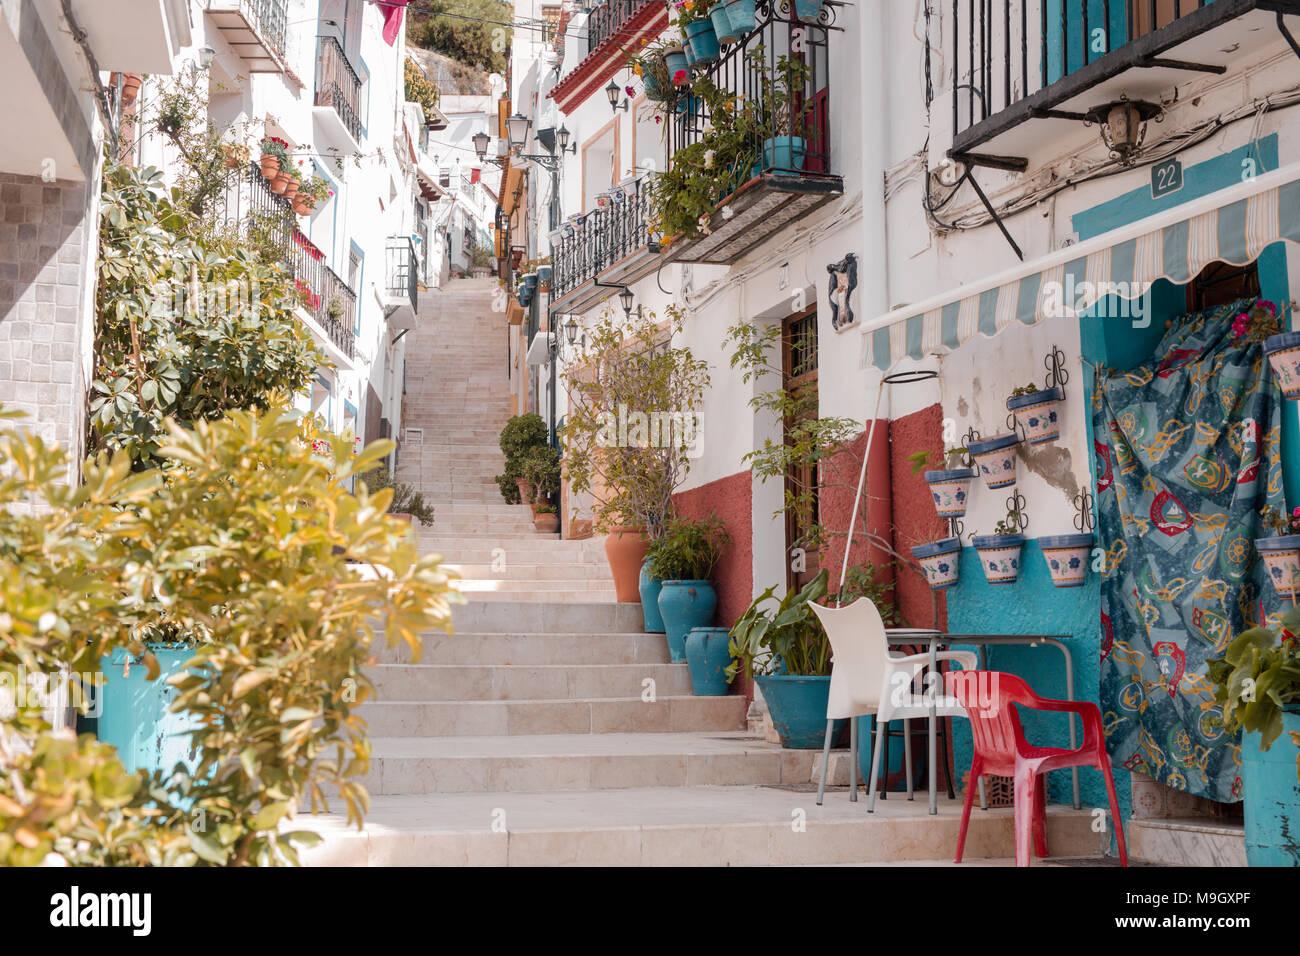 Casco Antiguo, Santa Cruz quarter, Alicante, Valencia province, Spain, Europe - Stock Image